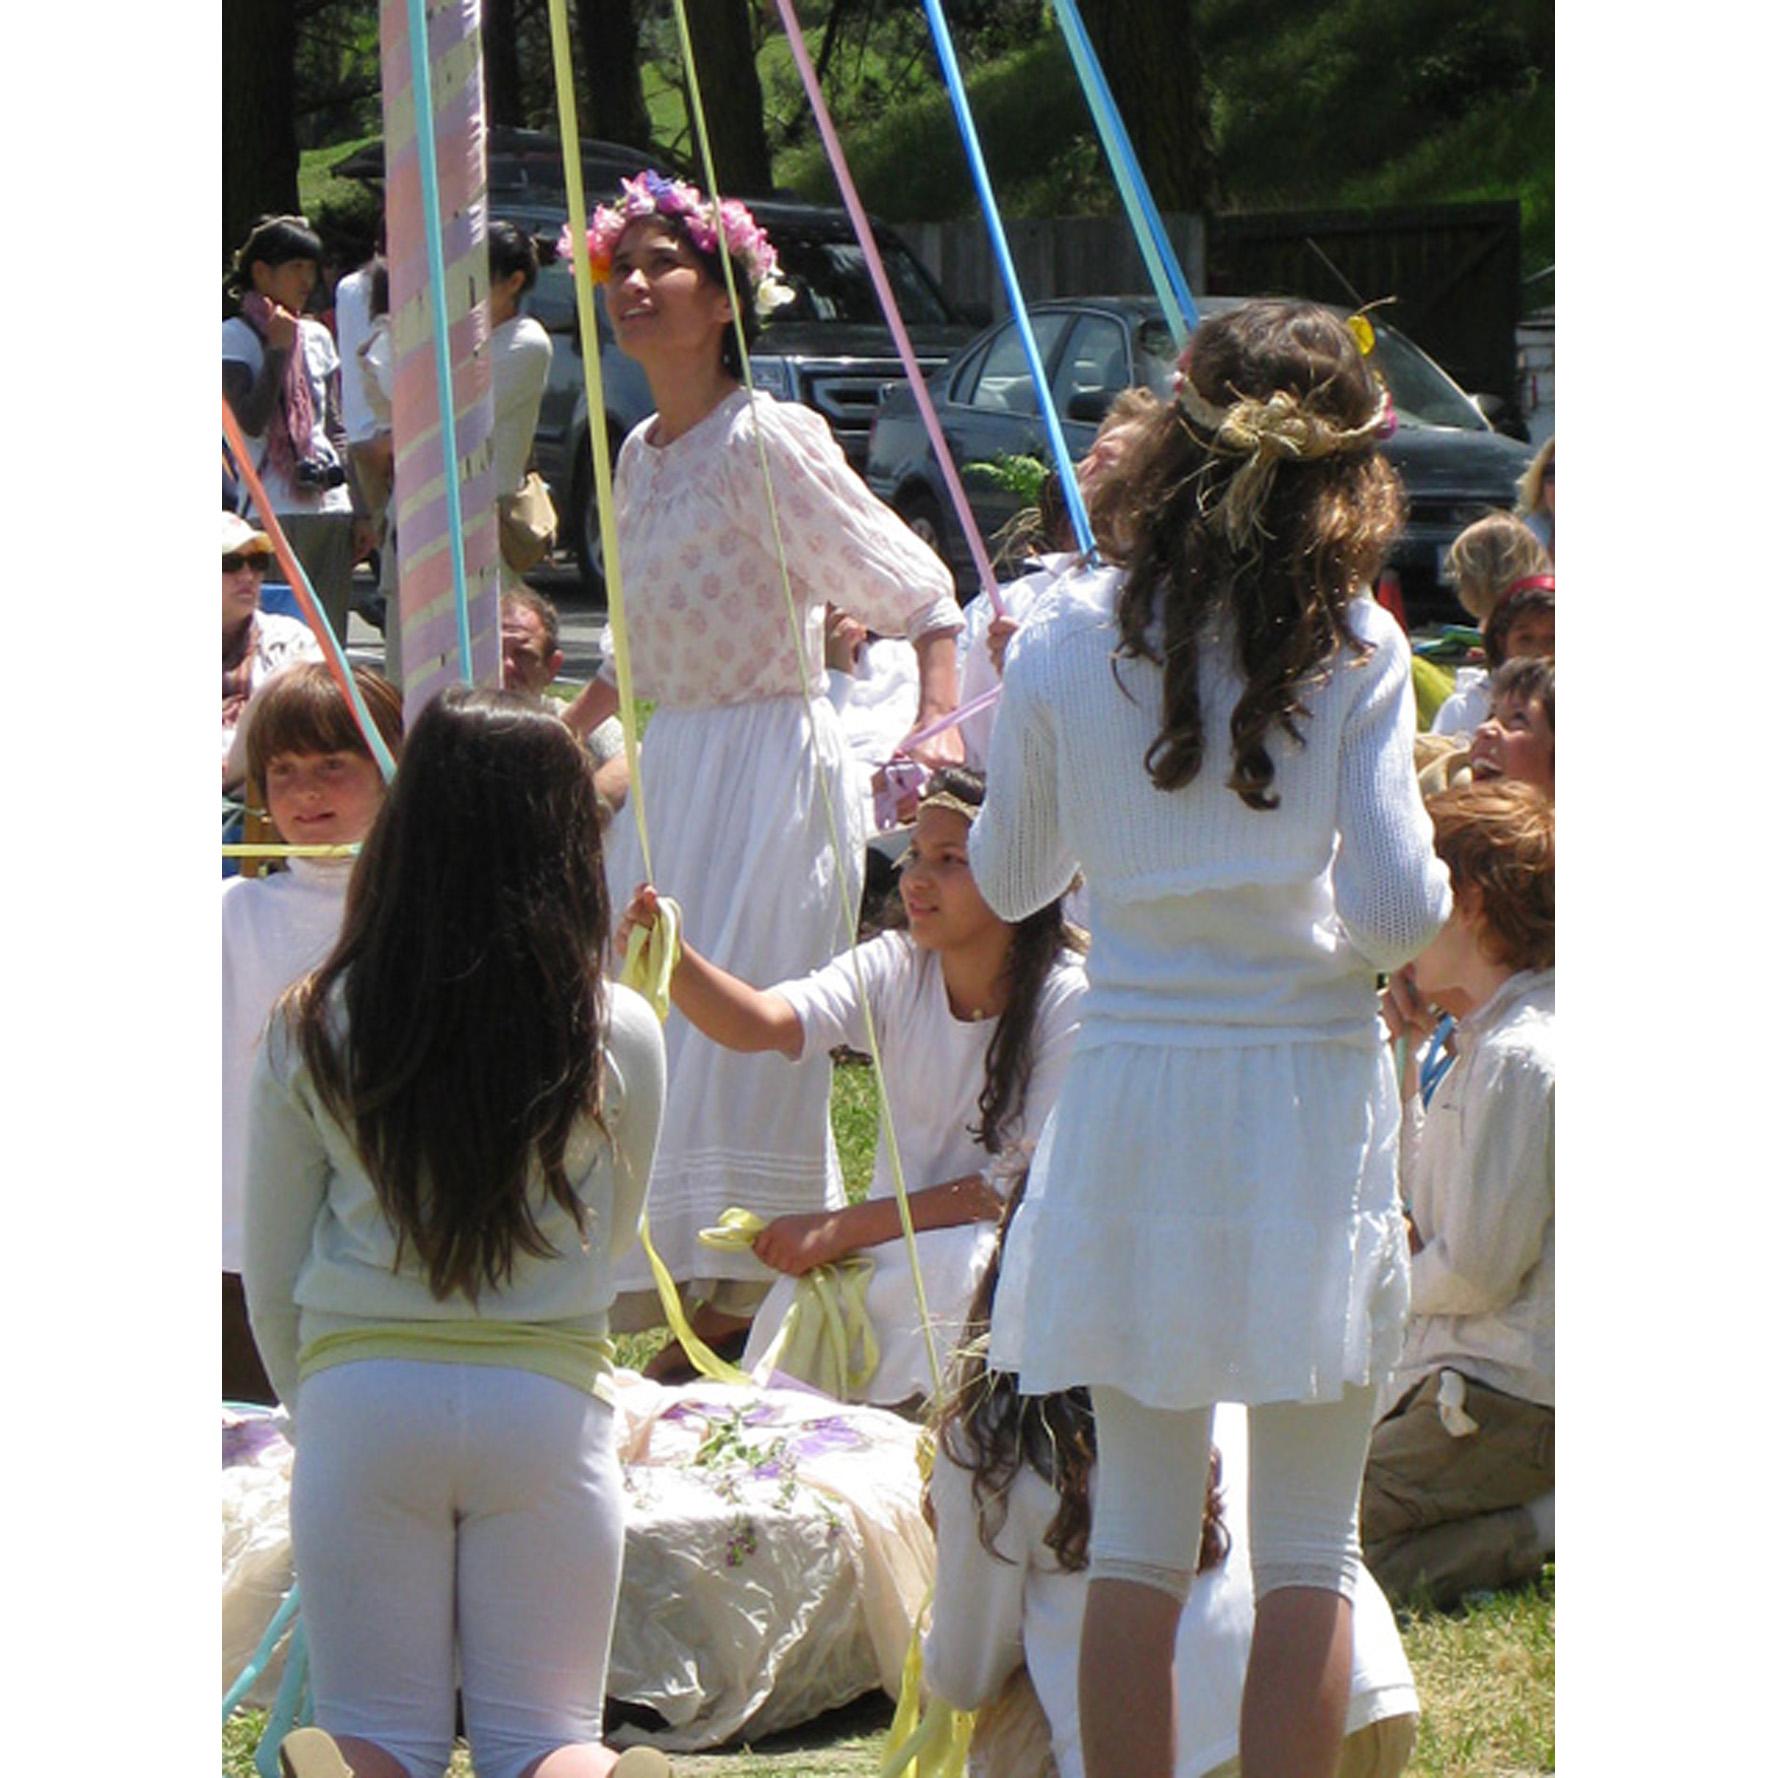 east-bay-waldorf-may-pole-dance-2.JPG